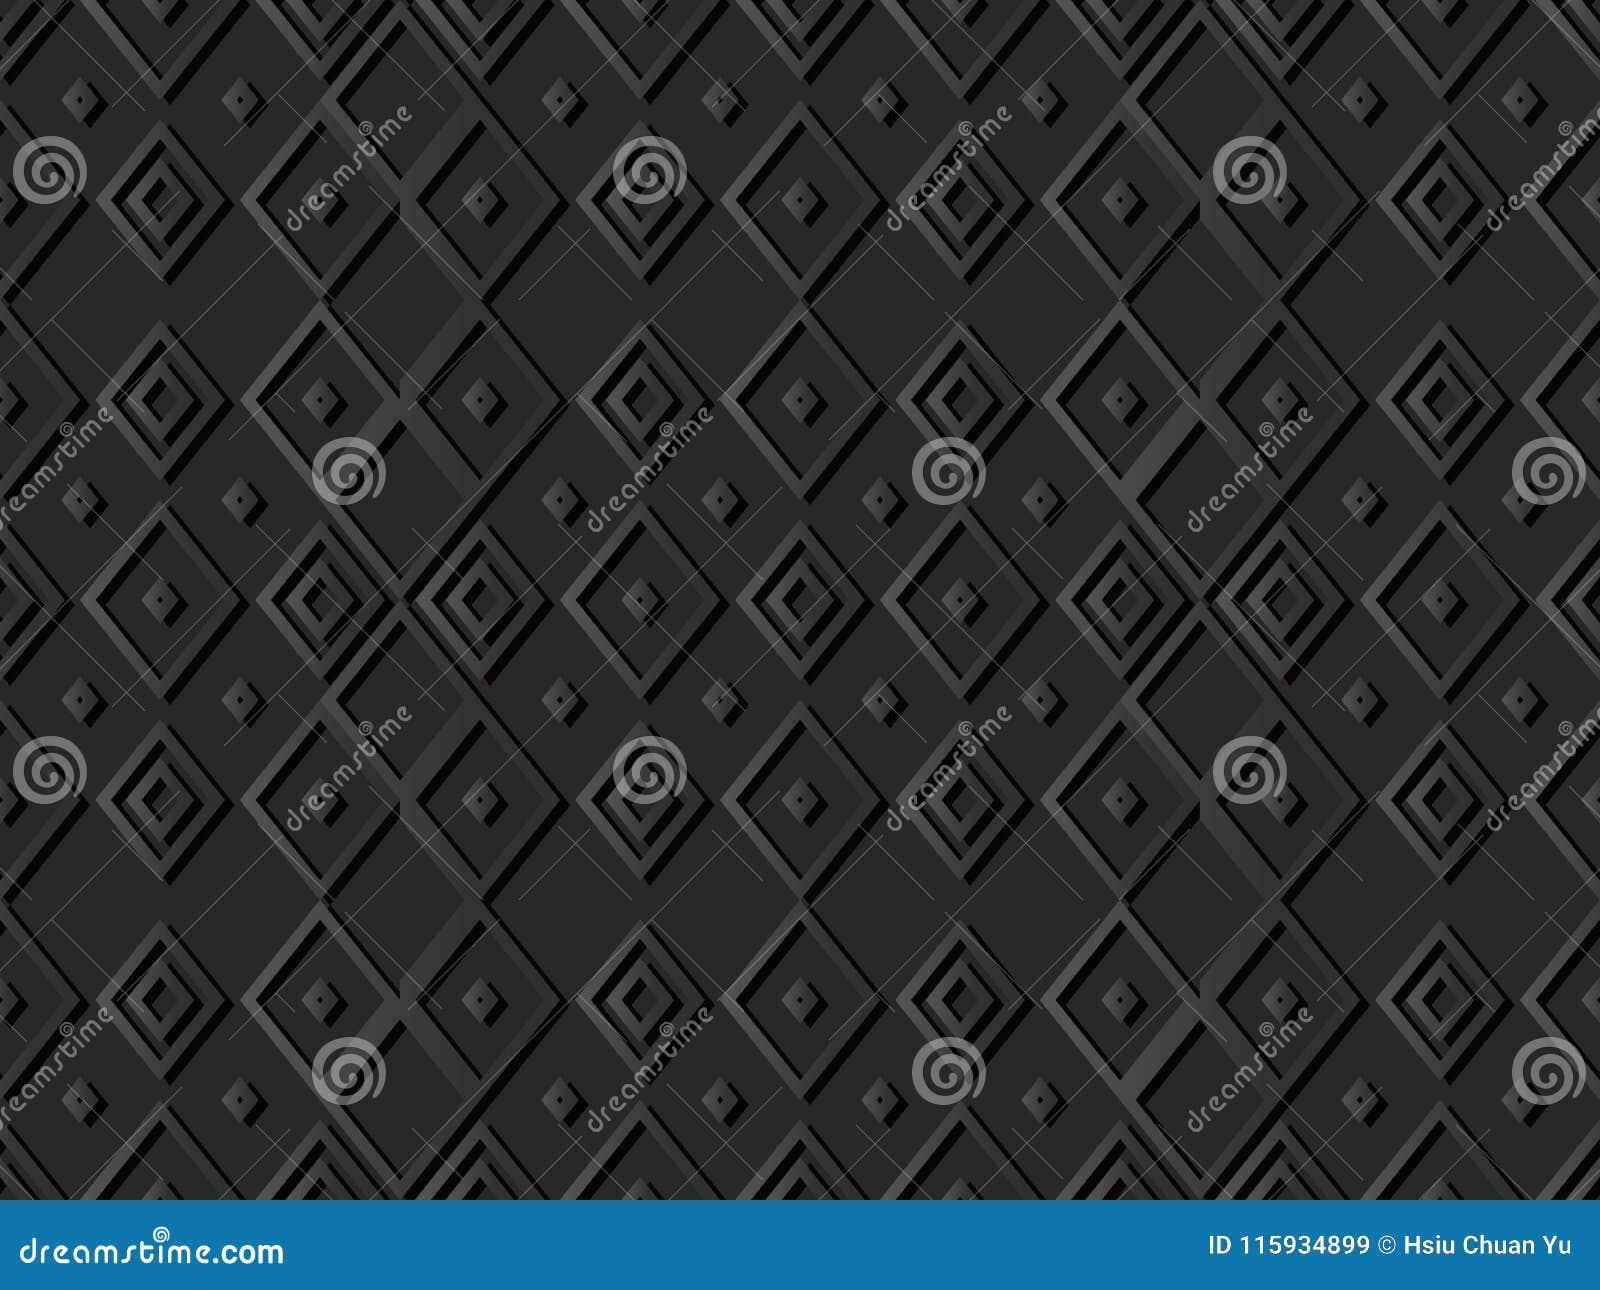 3D arte di carta scura Diamond Check Cross Rhomb Geometry